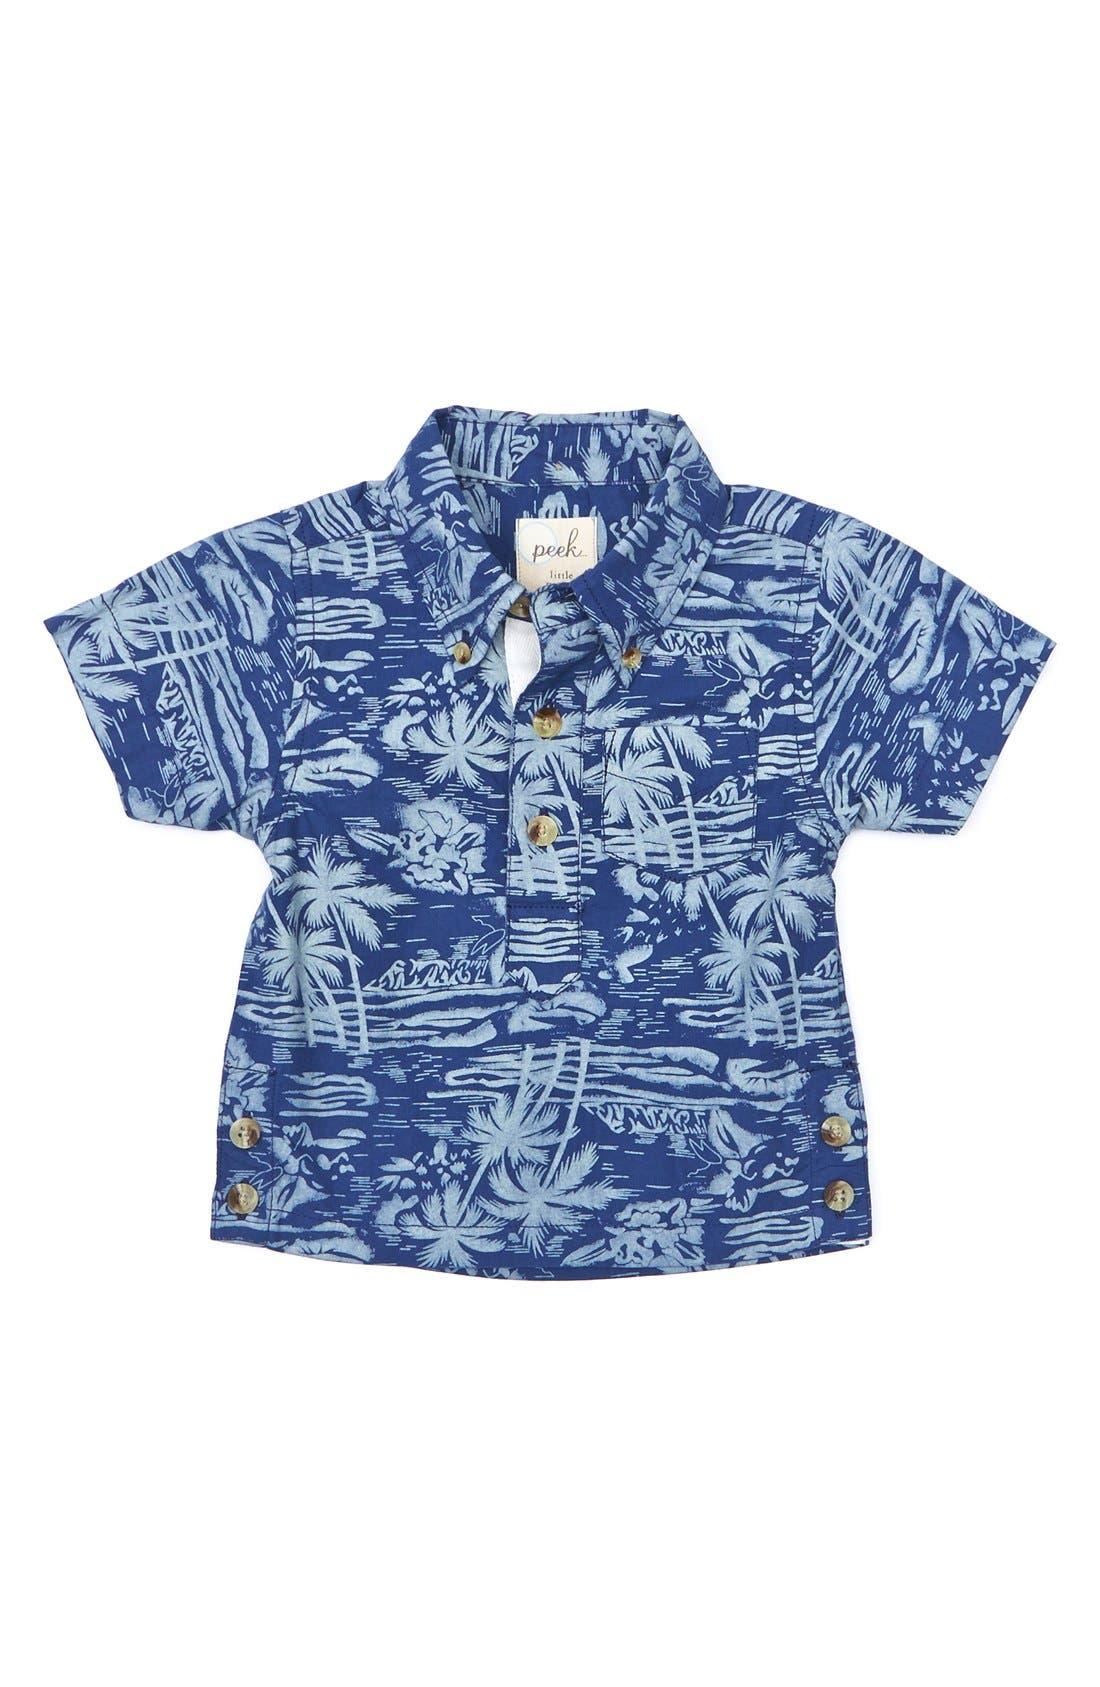 Main Image - Peek 'North Shore' Shirt (Baby Boys)